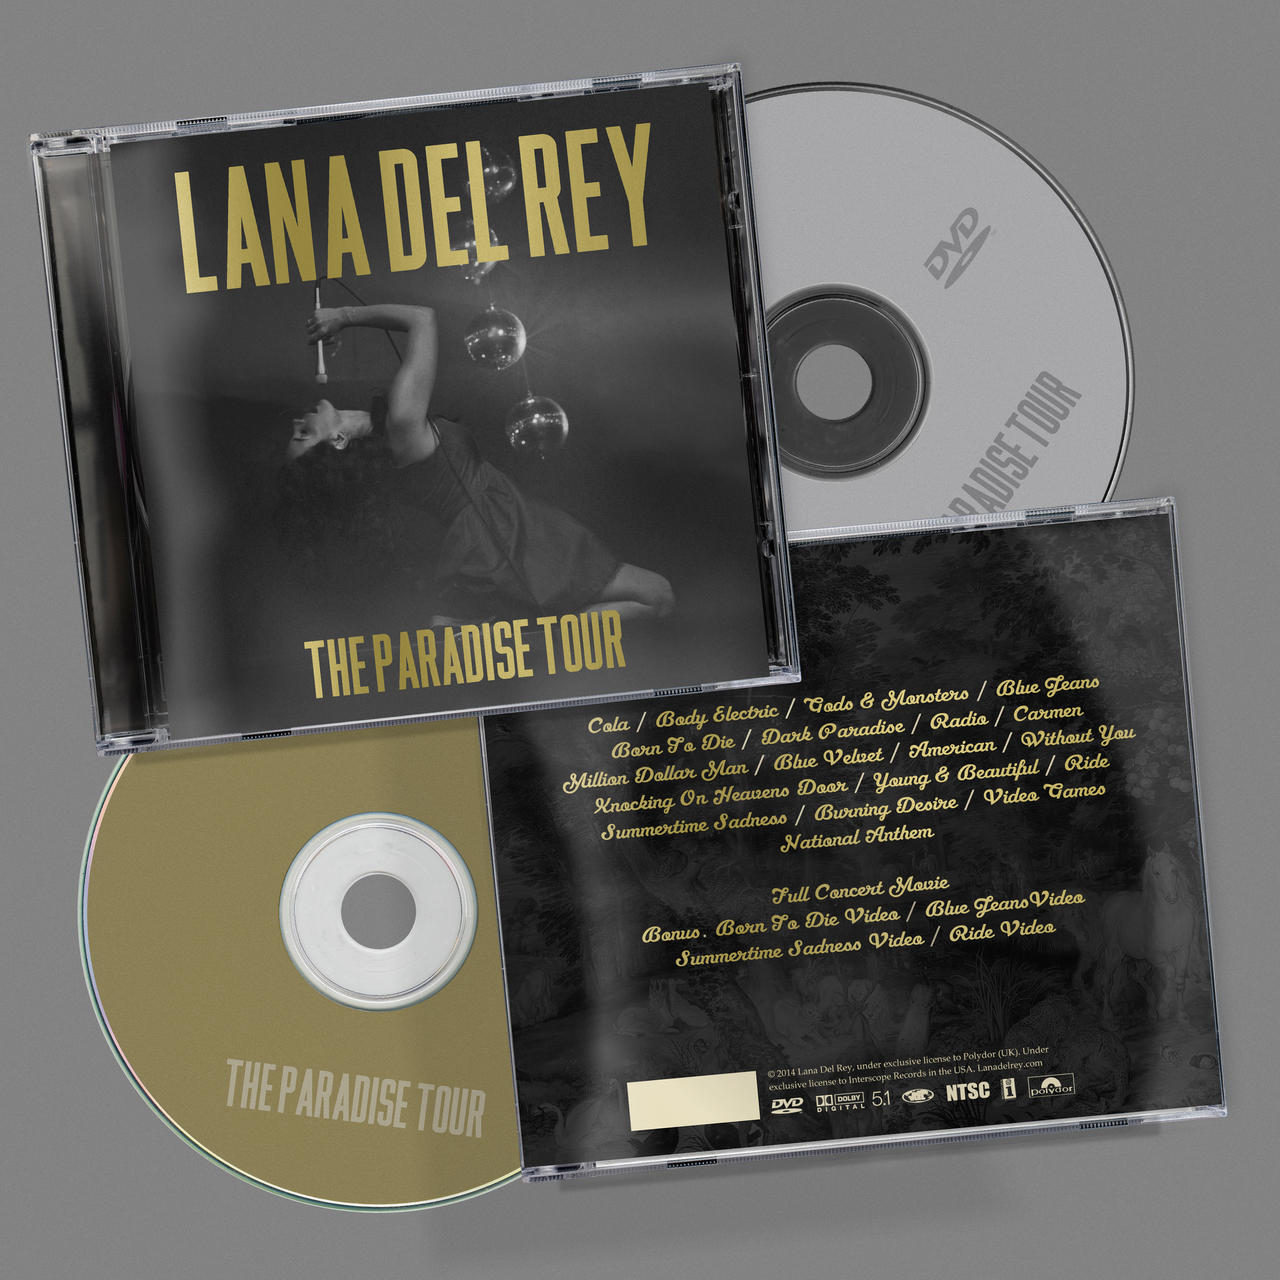 lana_del_rey_paradise_tour_mockup__by_ka